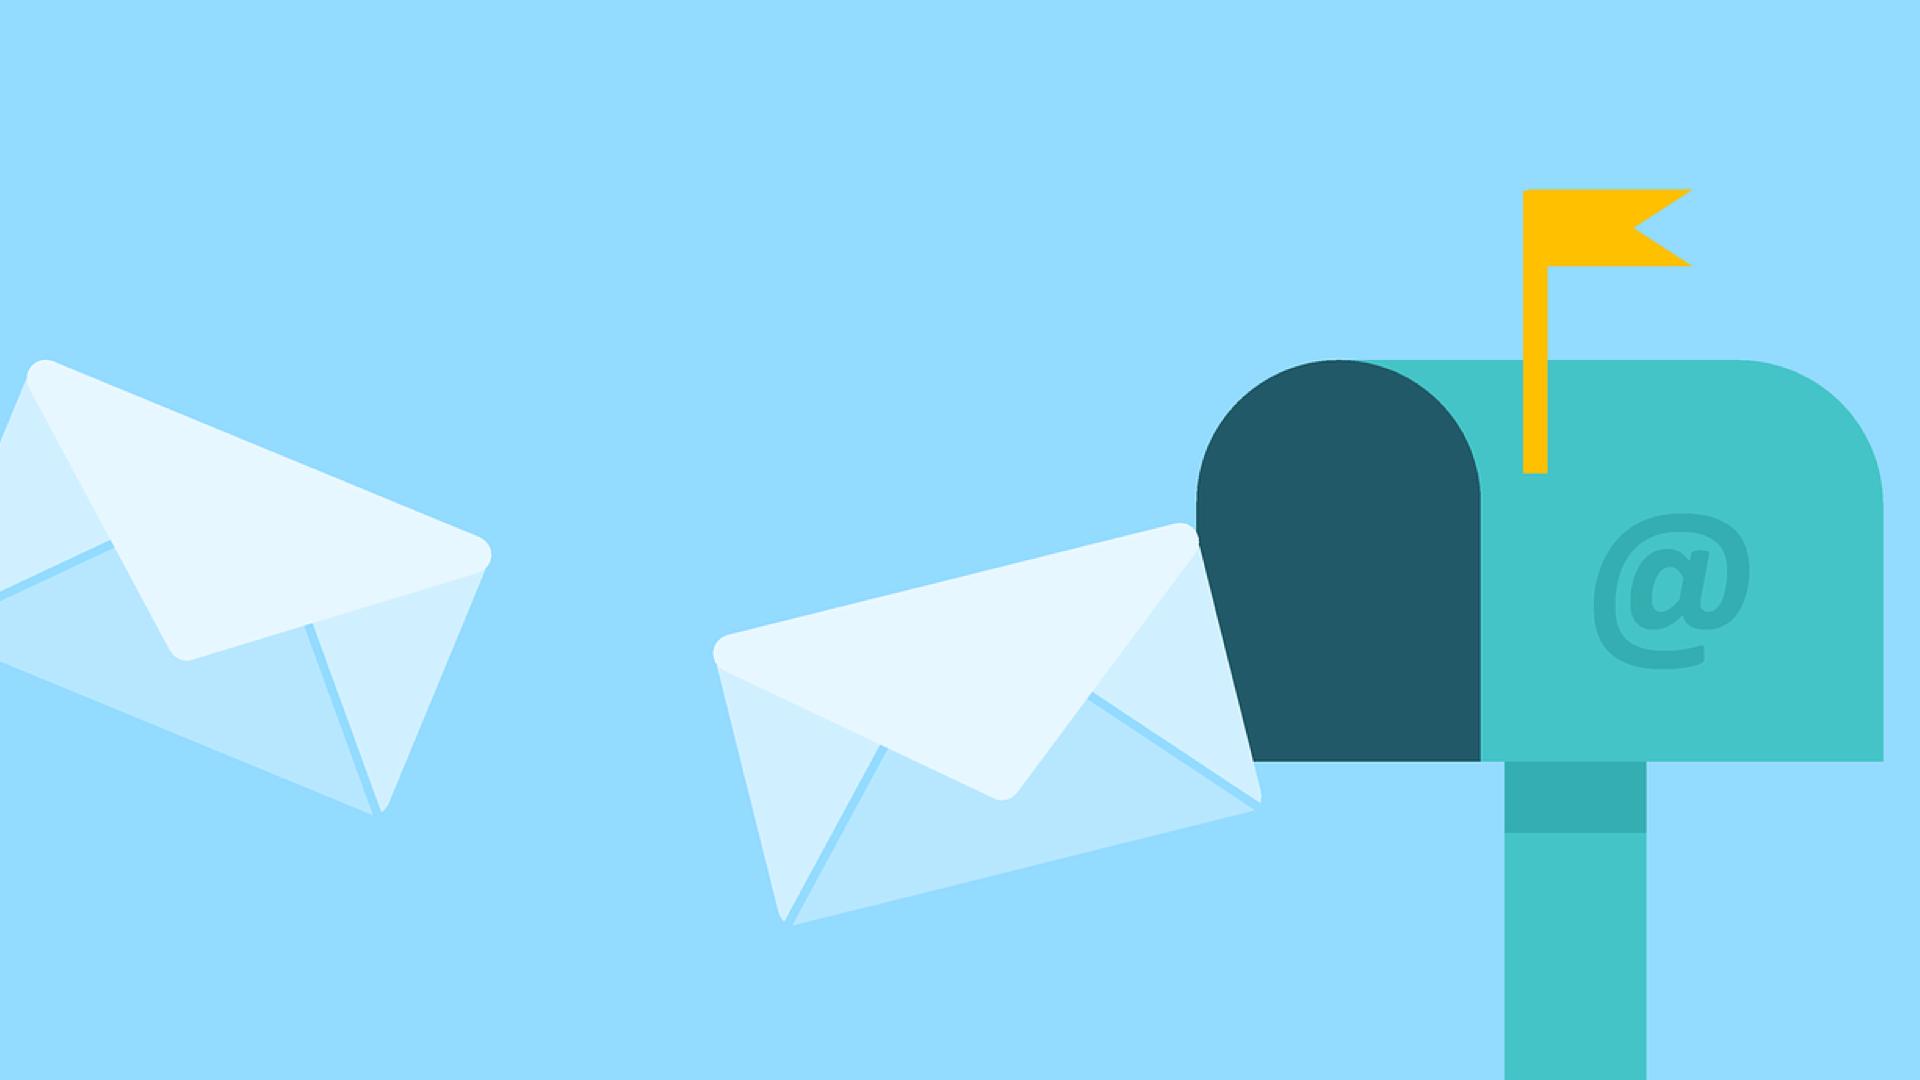 Manfaat Email Marketing untuk Jualan Online